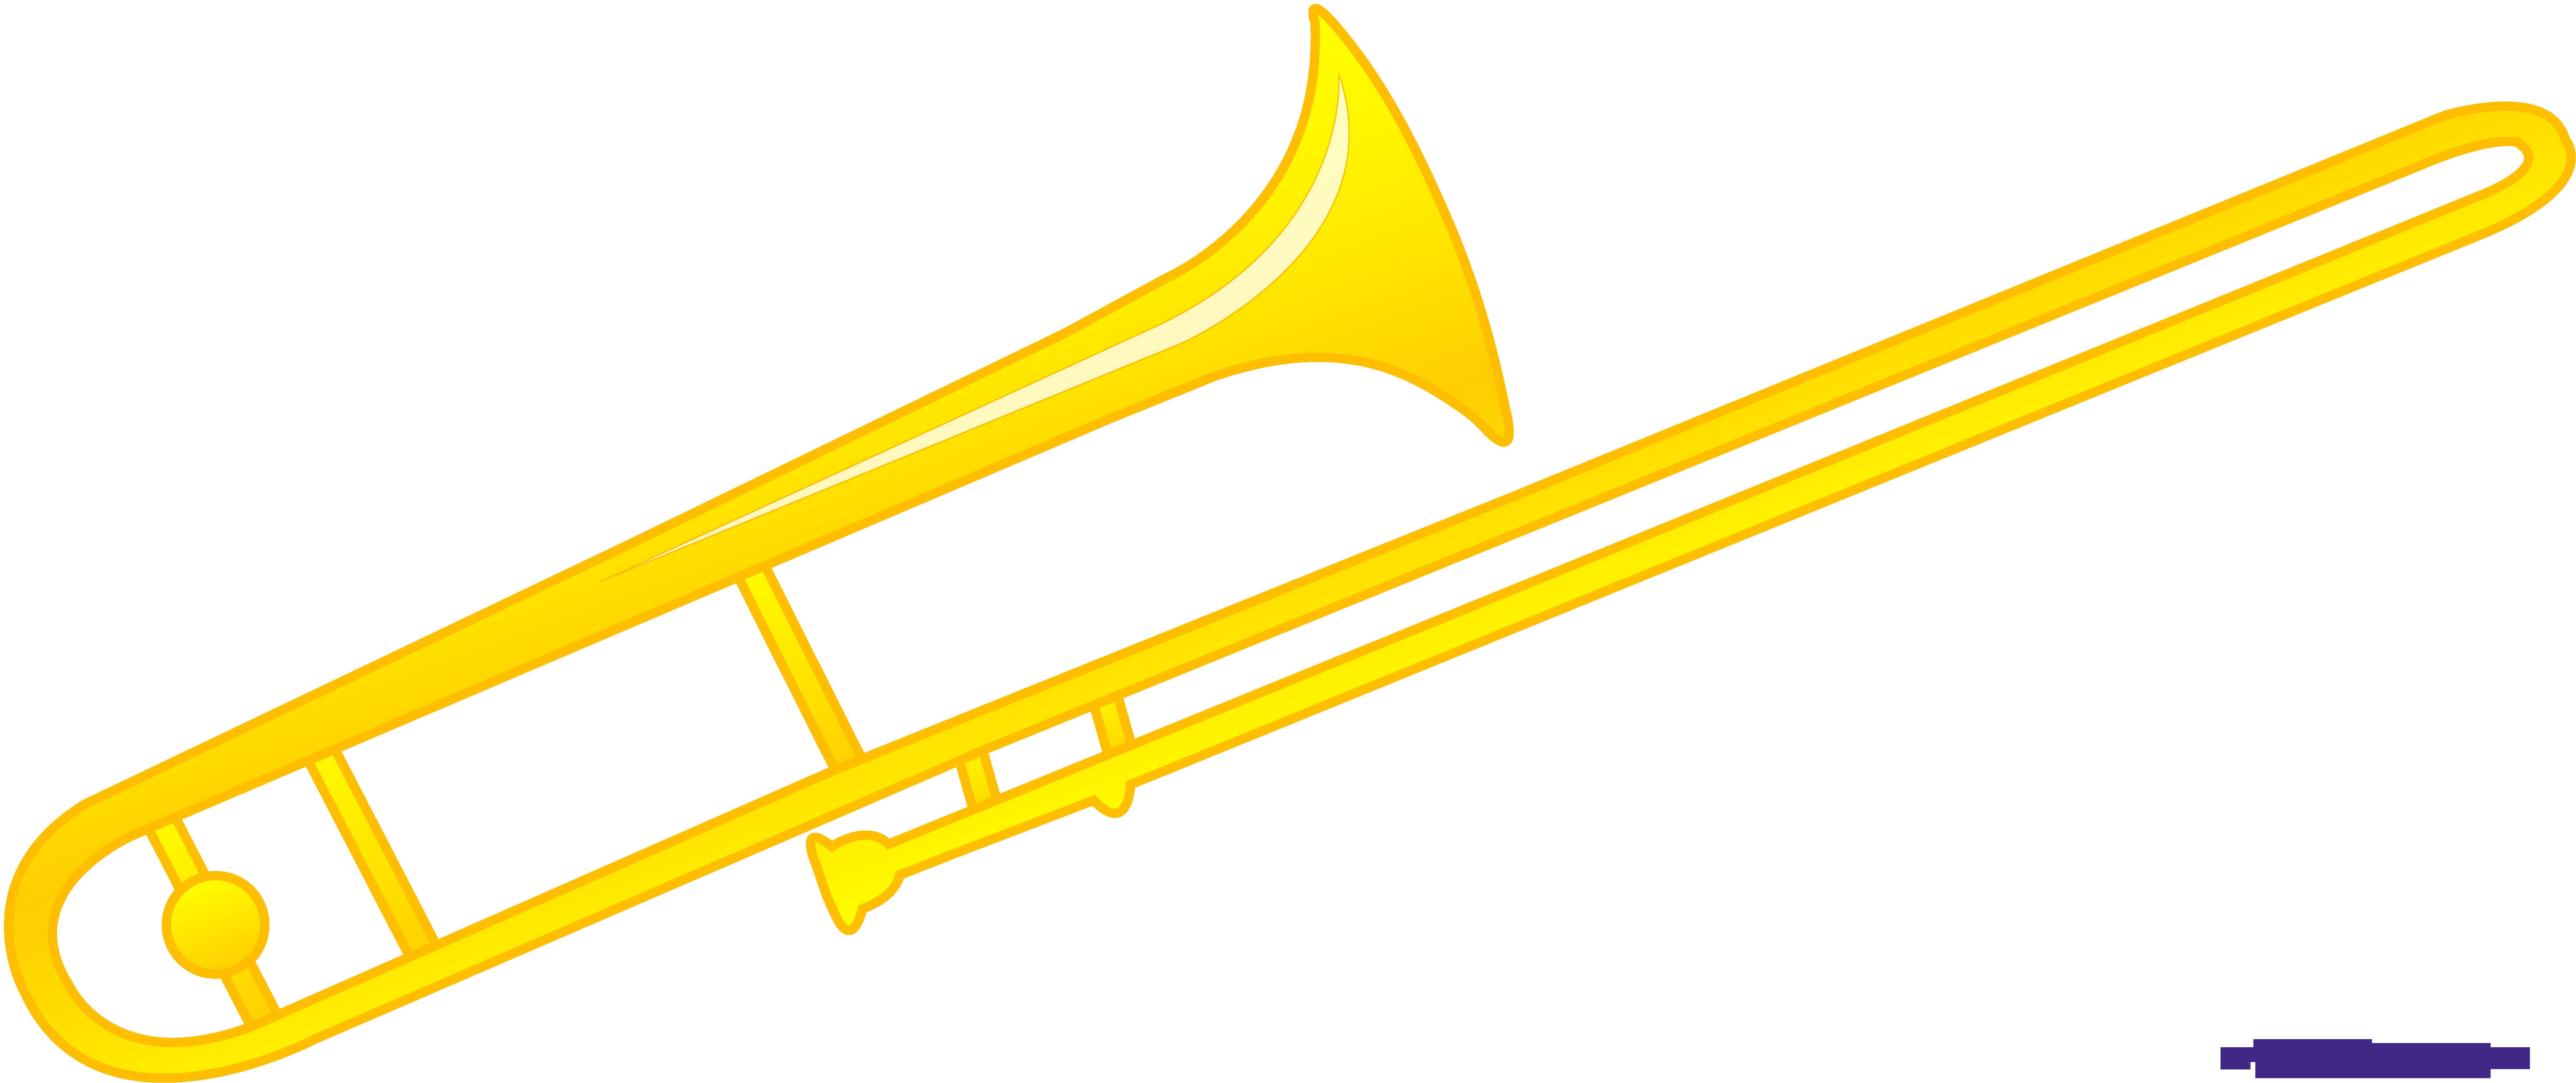 Sweet clip art. Trombone clipart